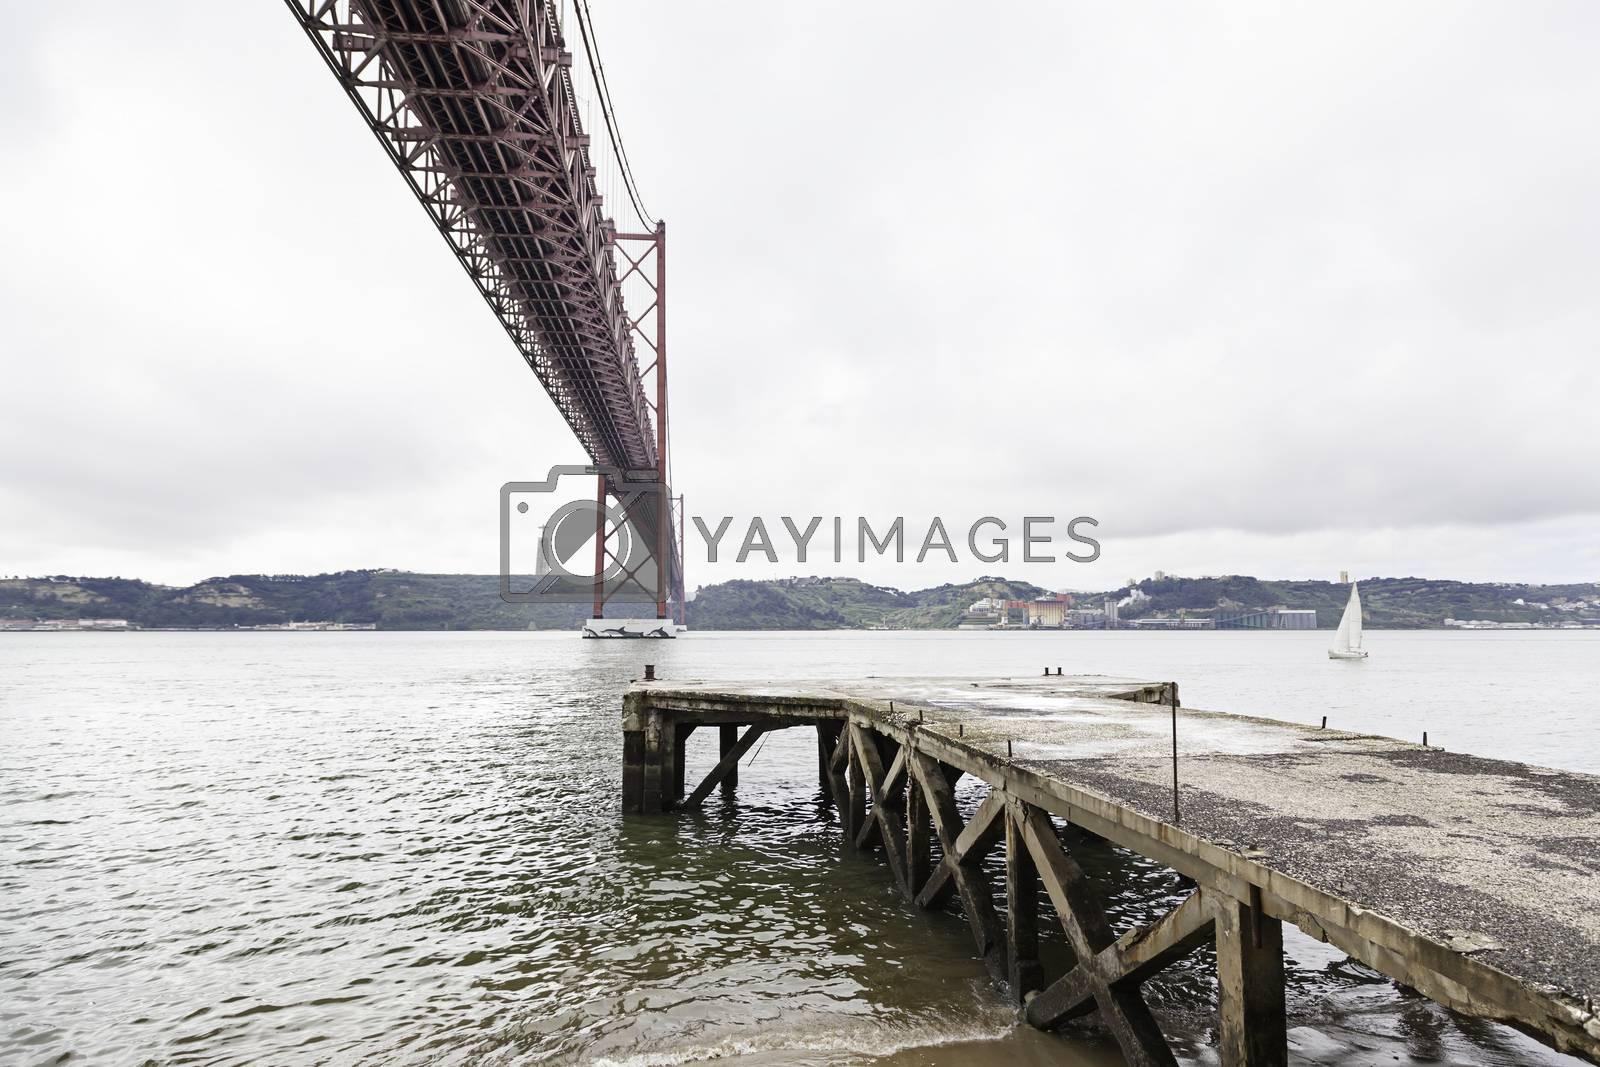 Suspension Bridge over the Tagus river in Lisbon, Portugal, Eutopean travel